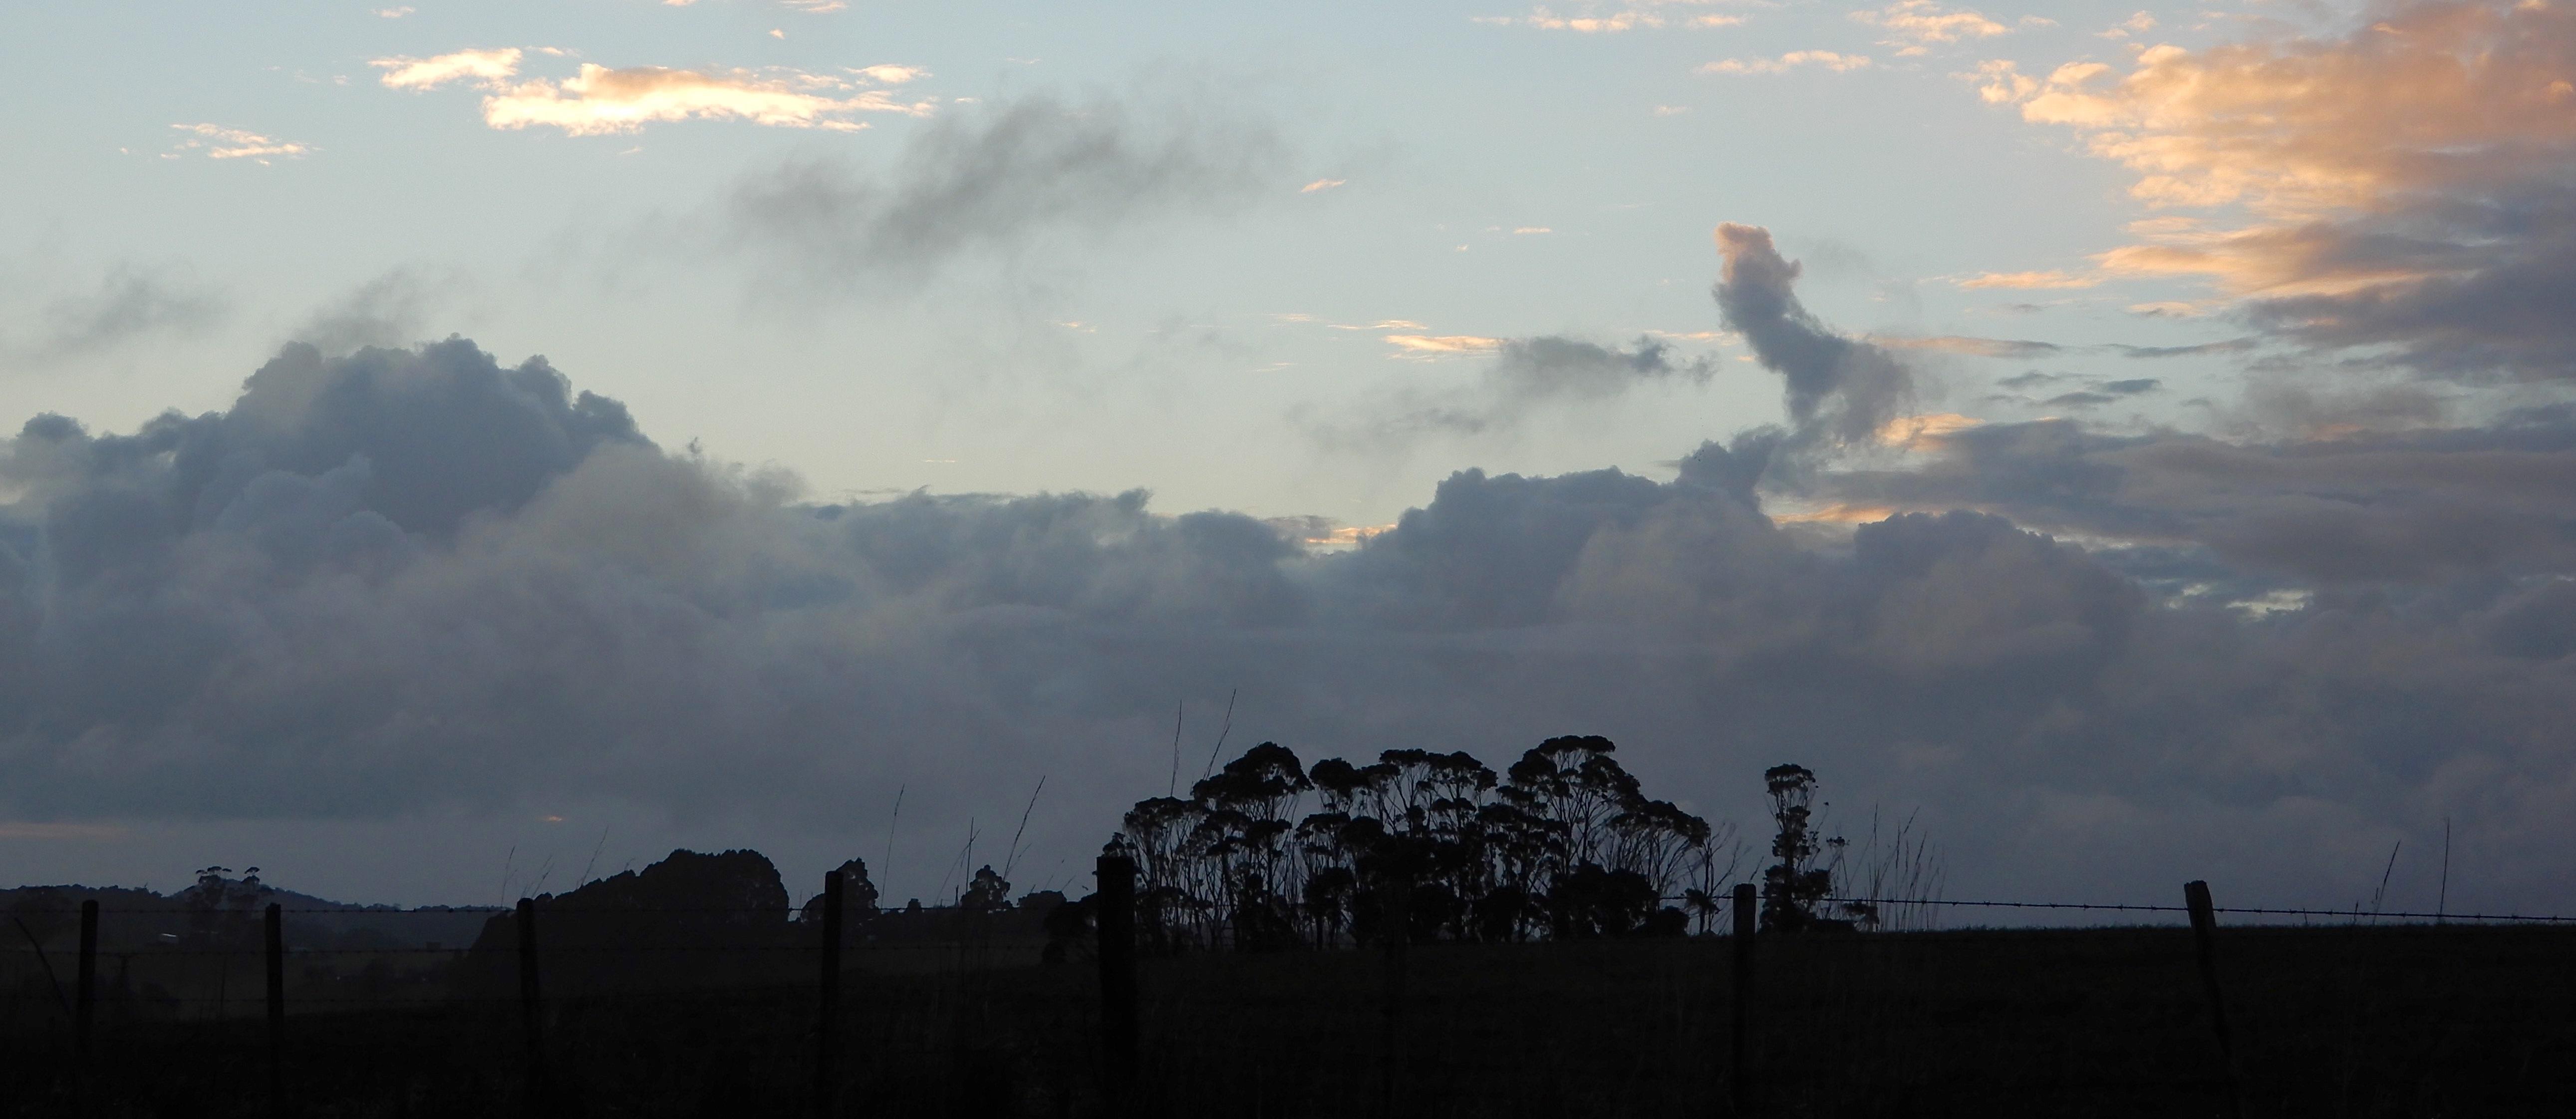 3.storm clouds